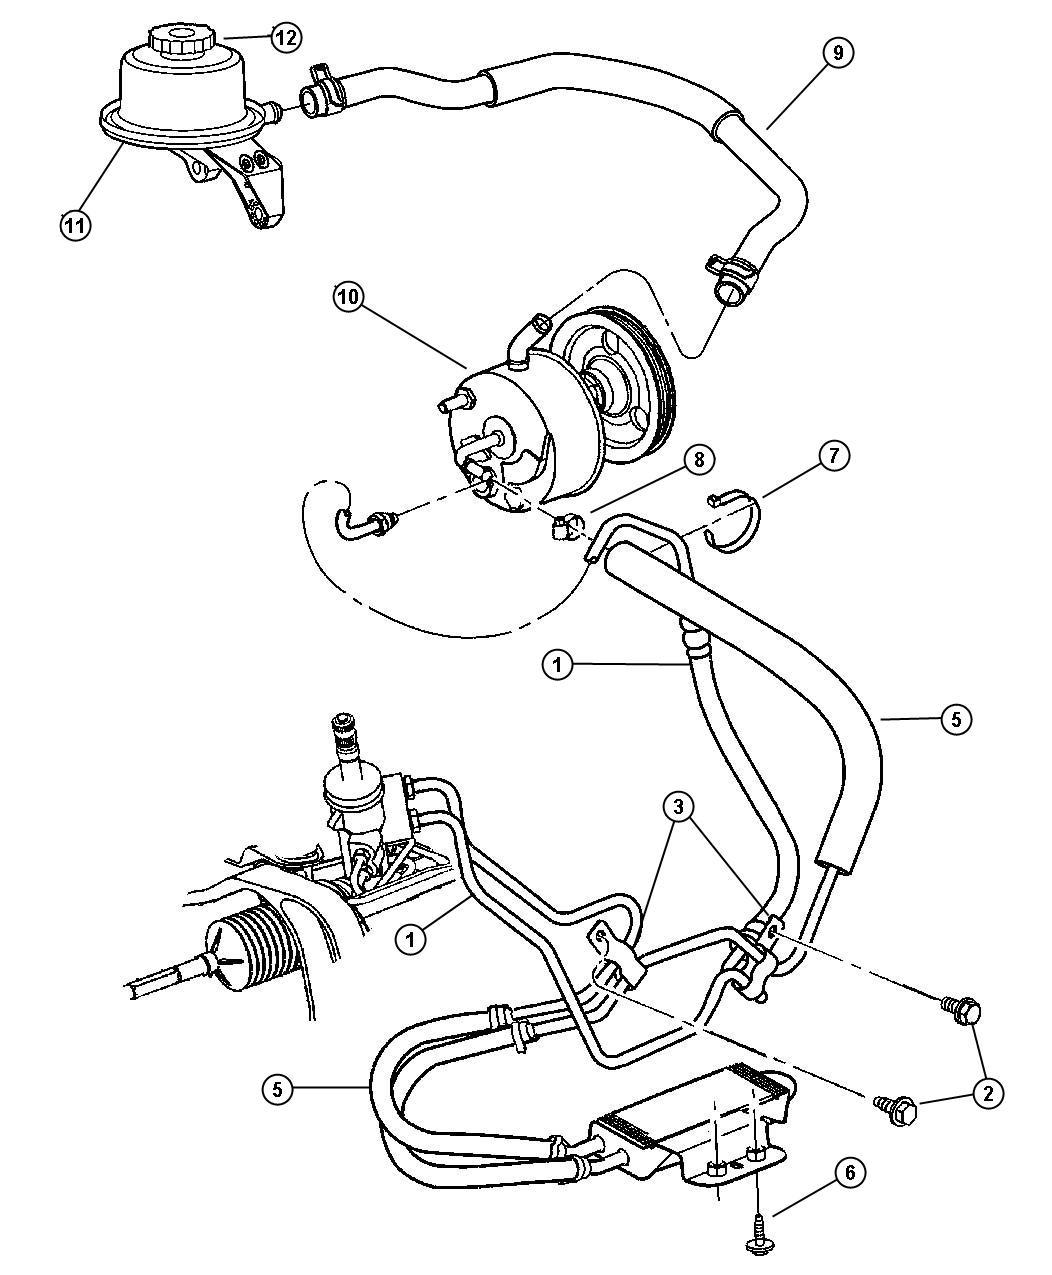 Chrysler Voyager Hose. Power steering. Reservoir to pump